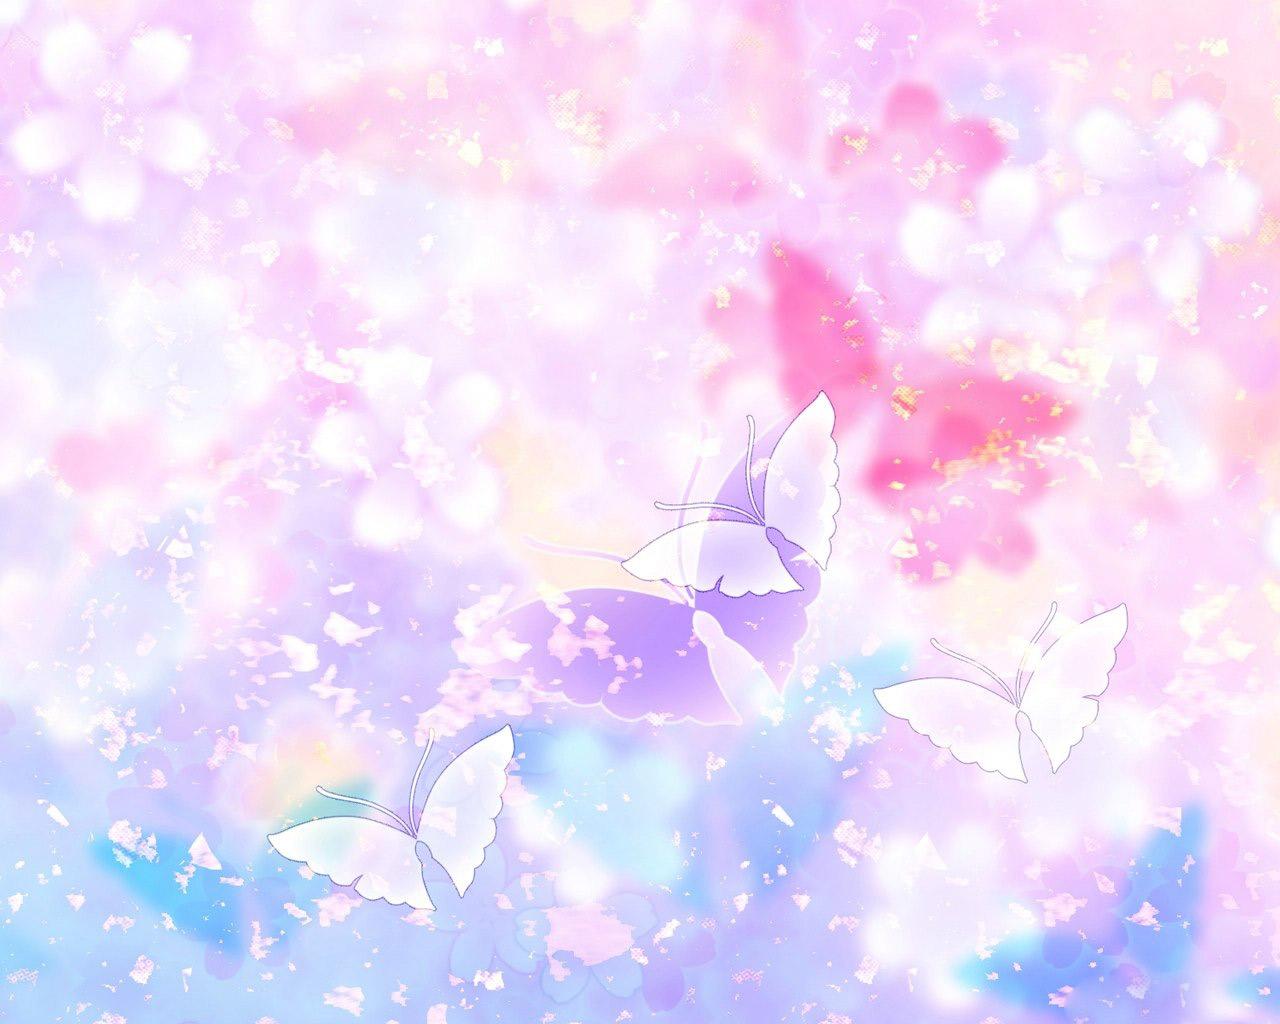 Download Flowers and Butterflies clipart desktop hd Wallpaper in high ...